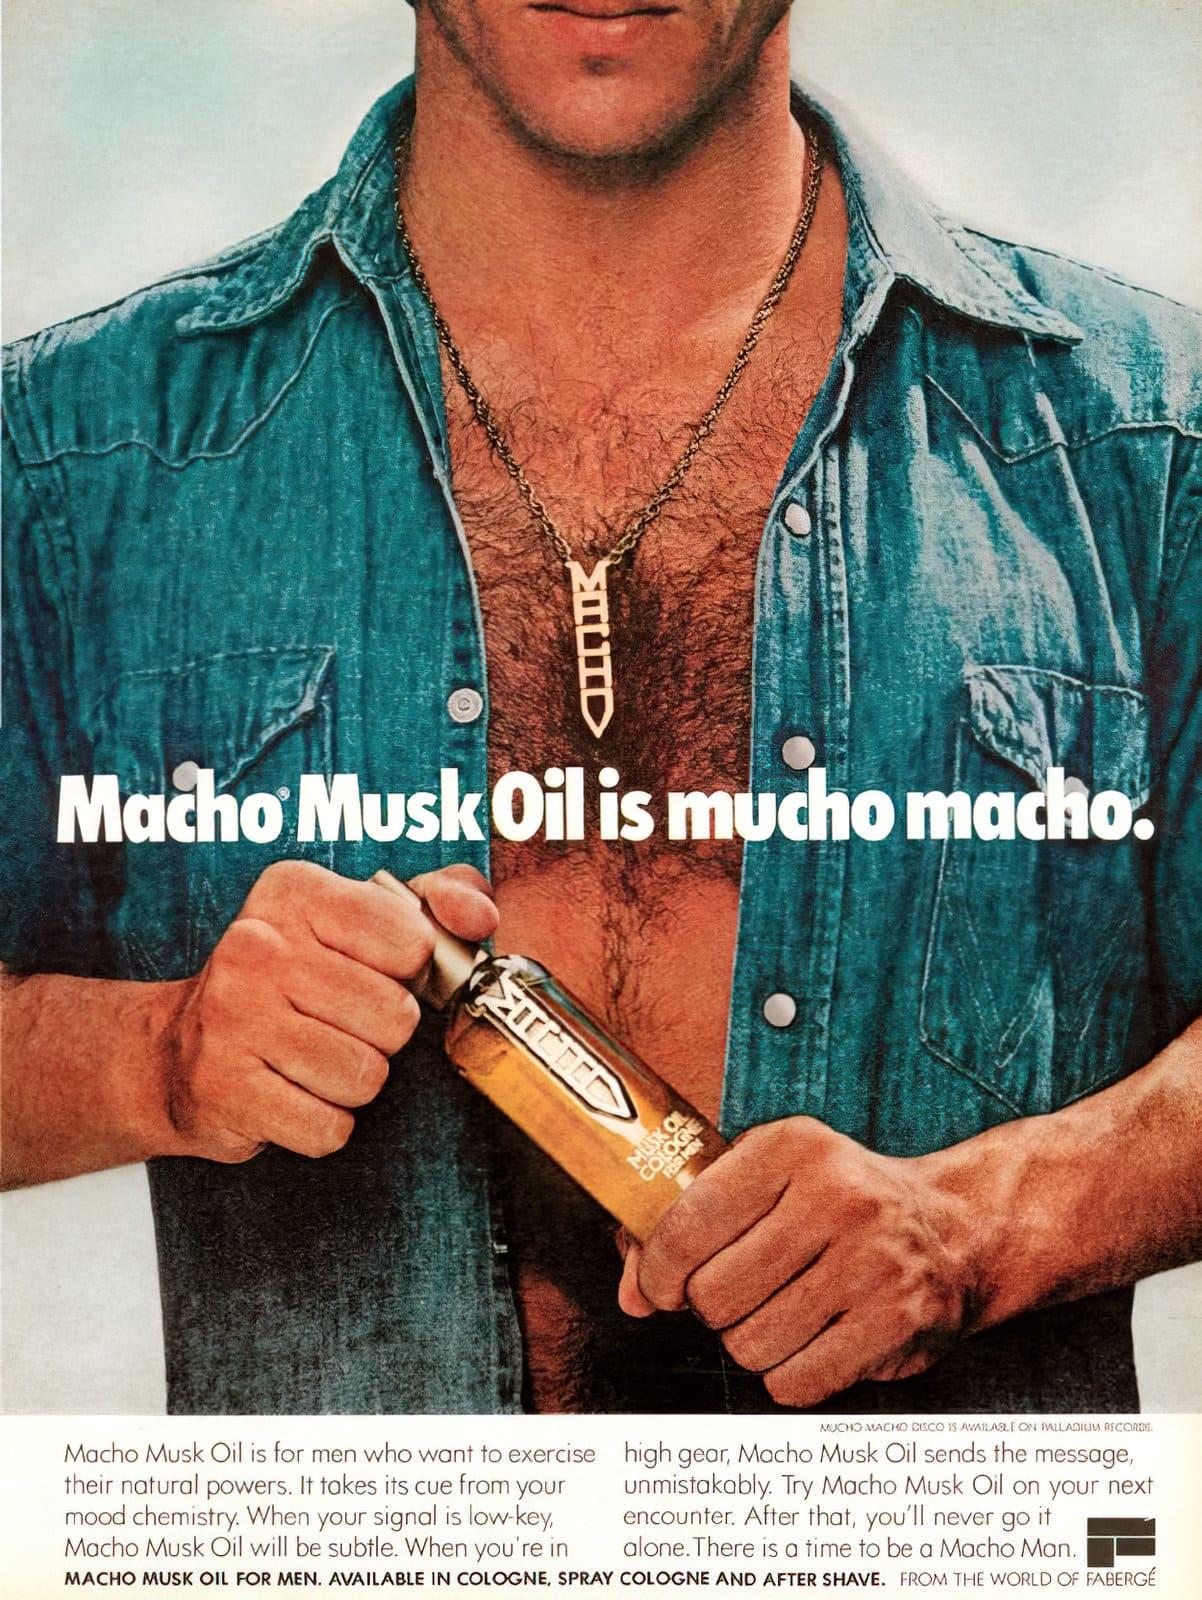 Vintage Macho Musk Oil for men (1978)